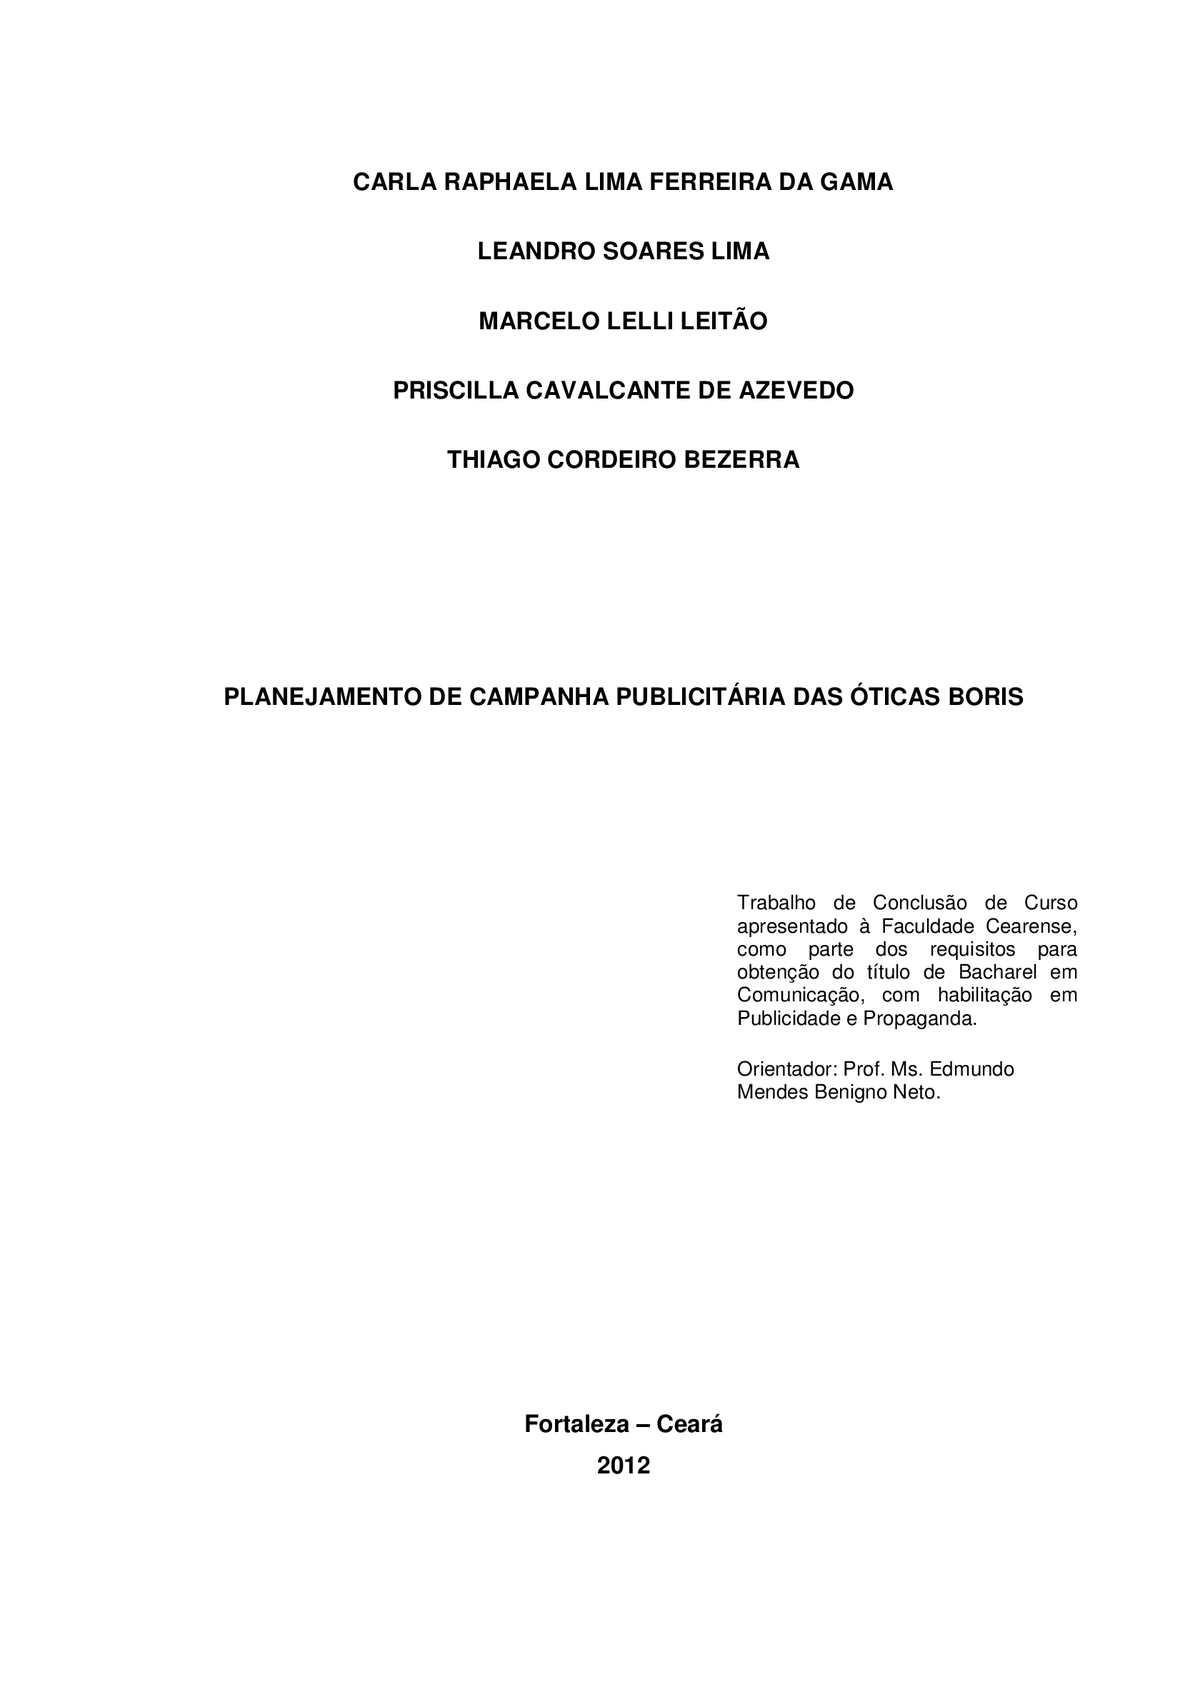 TCC Oticas Boris - CALAMEO Downloader 463c89226e